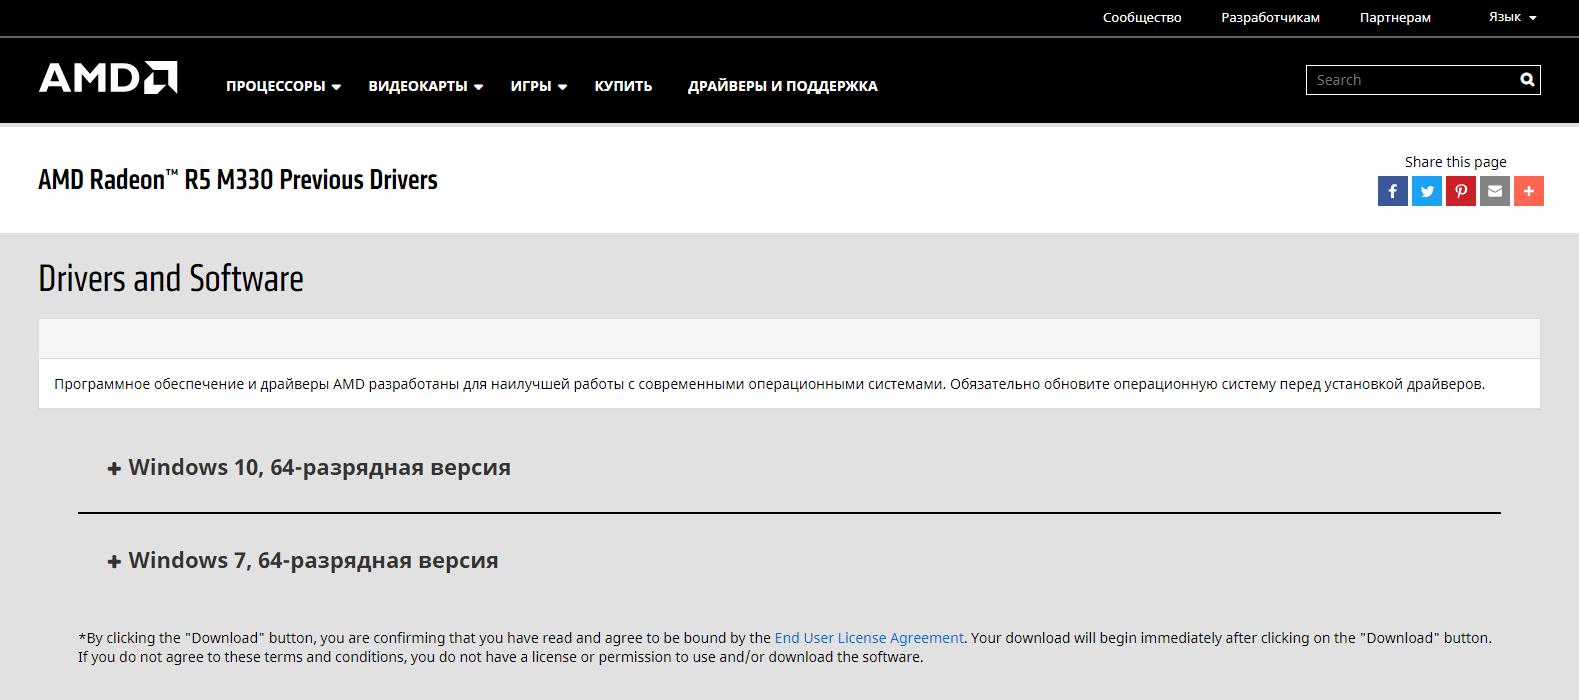 Скачивание и обновление OpenGL на сайте AMD